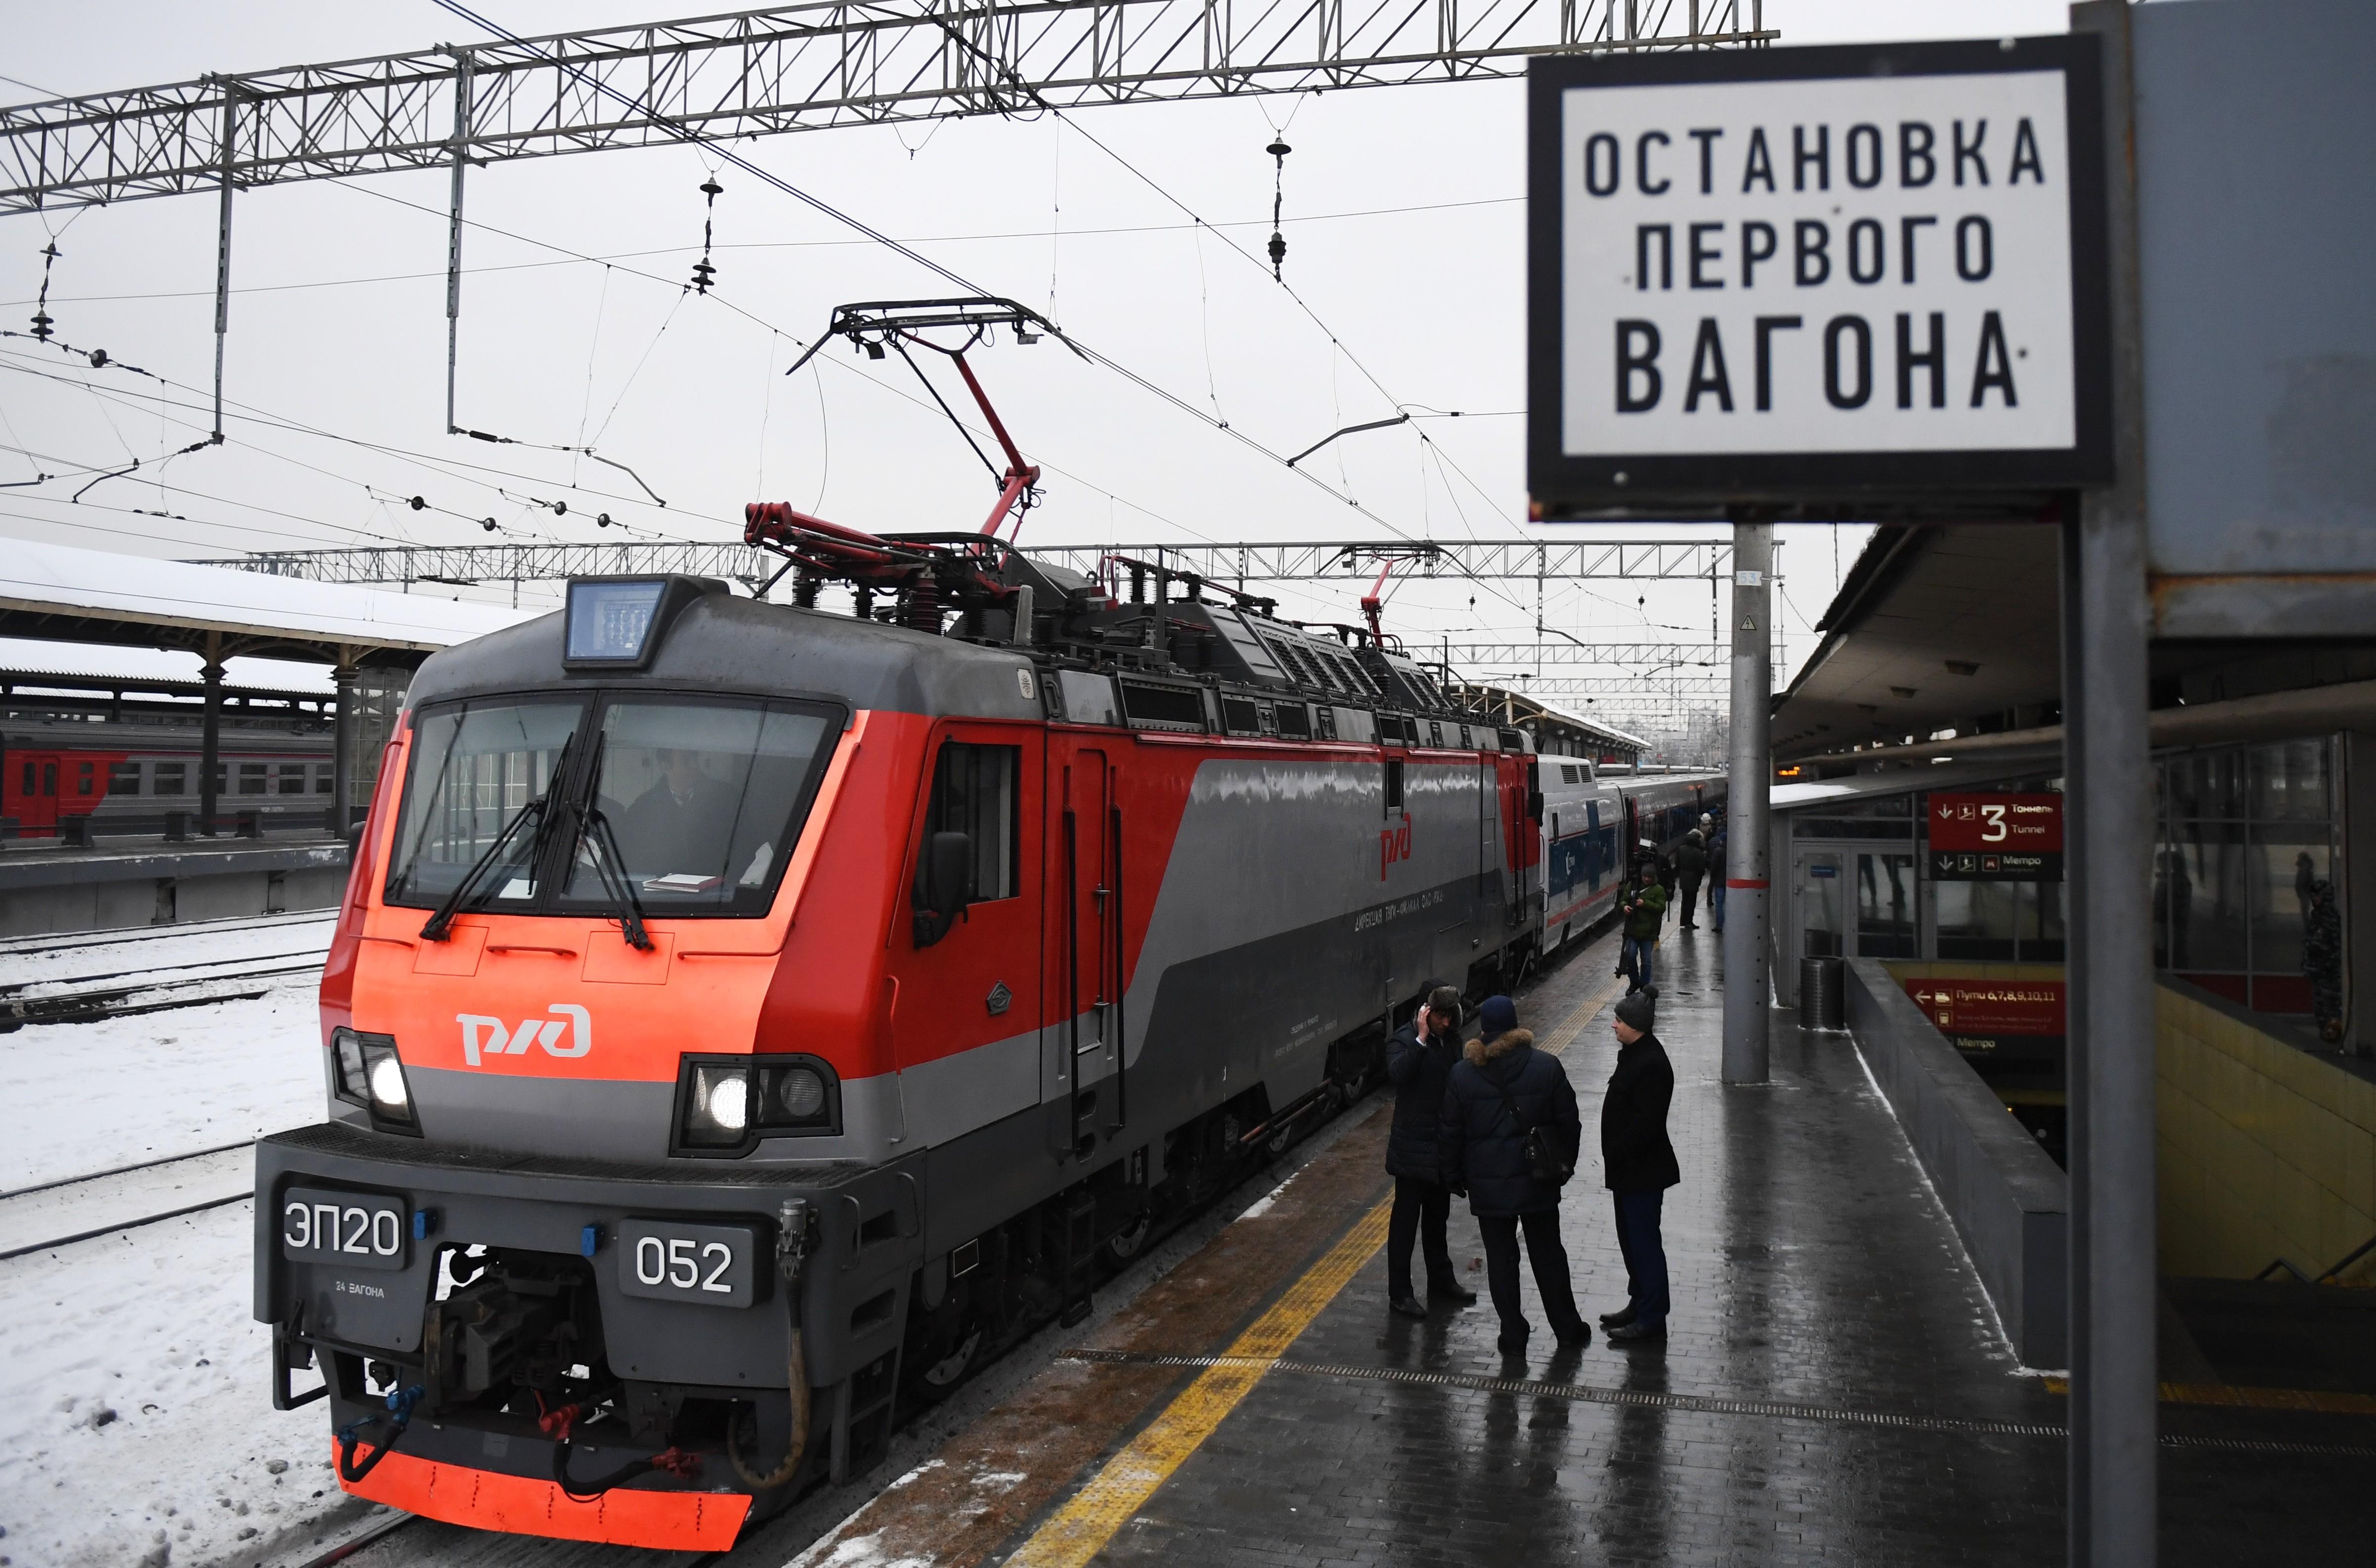 <p><span>Фото: &copy;РИА Новости/Илья Питалев</span></p>